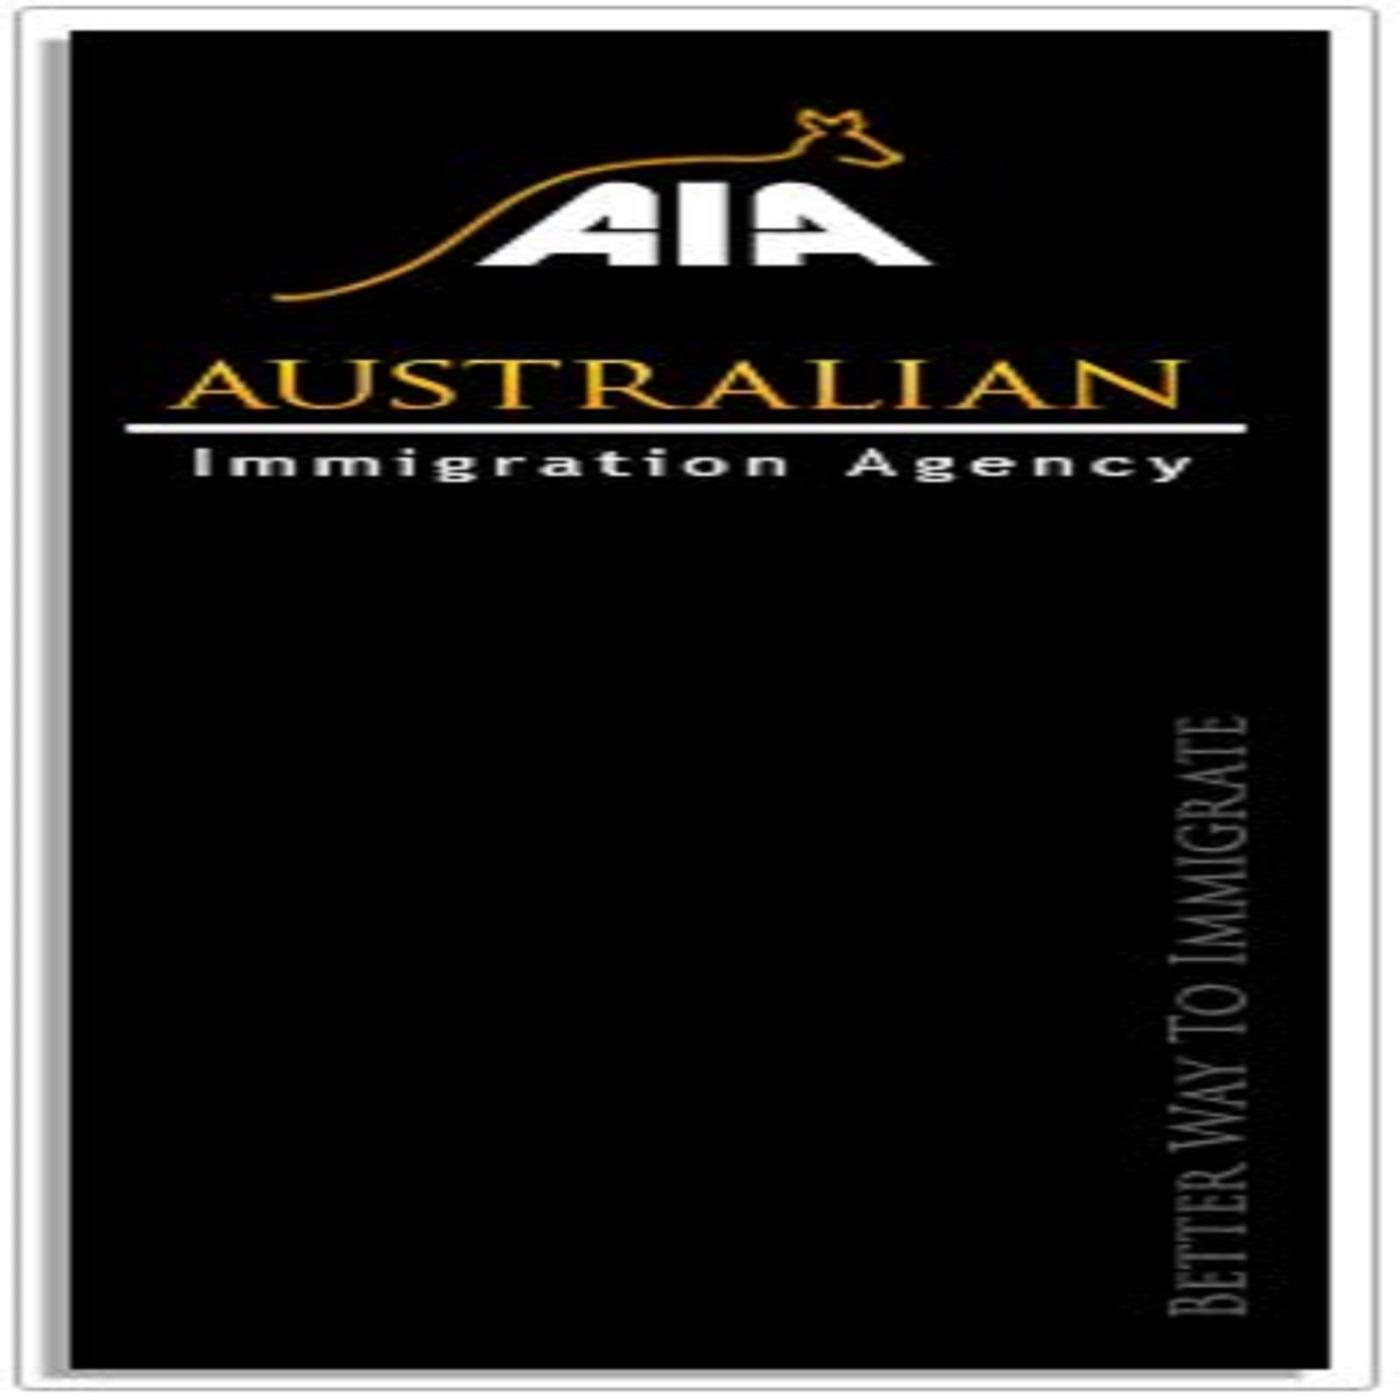 Australian Immigration Agency (@australianimmigrationagency2) Cover Image